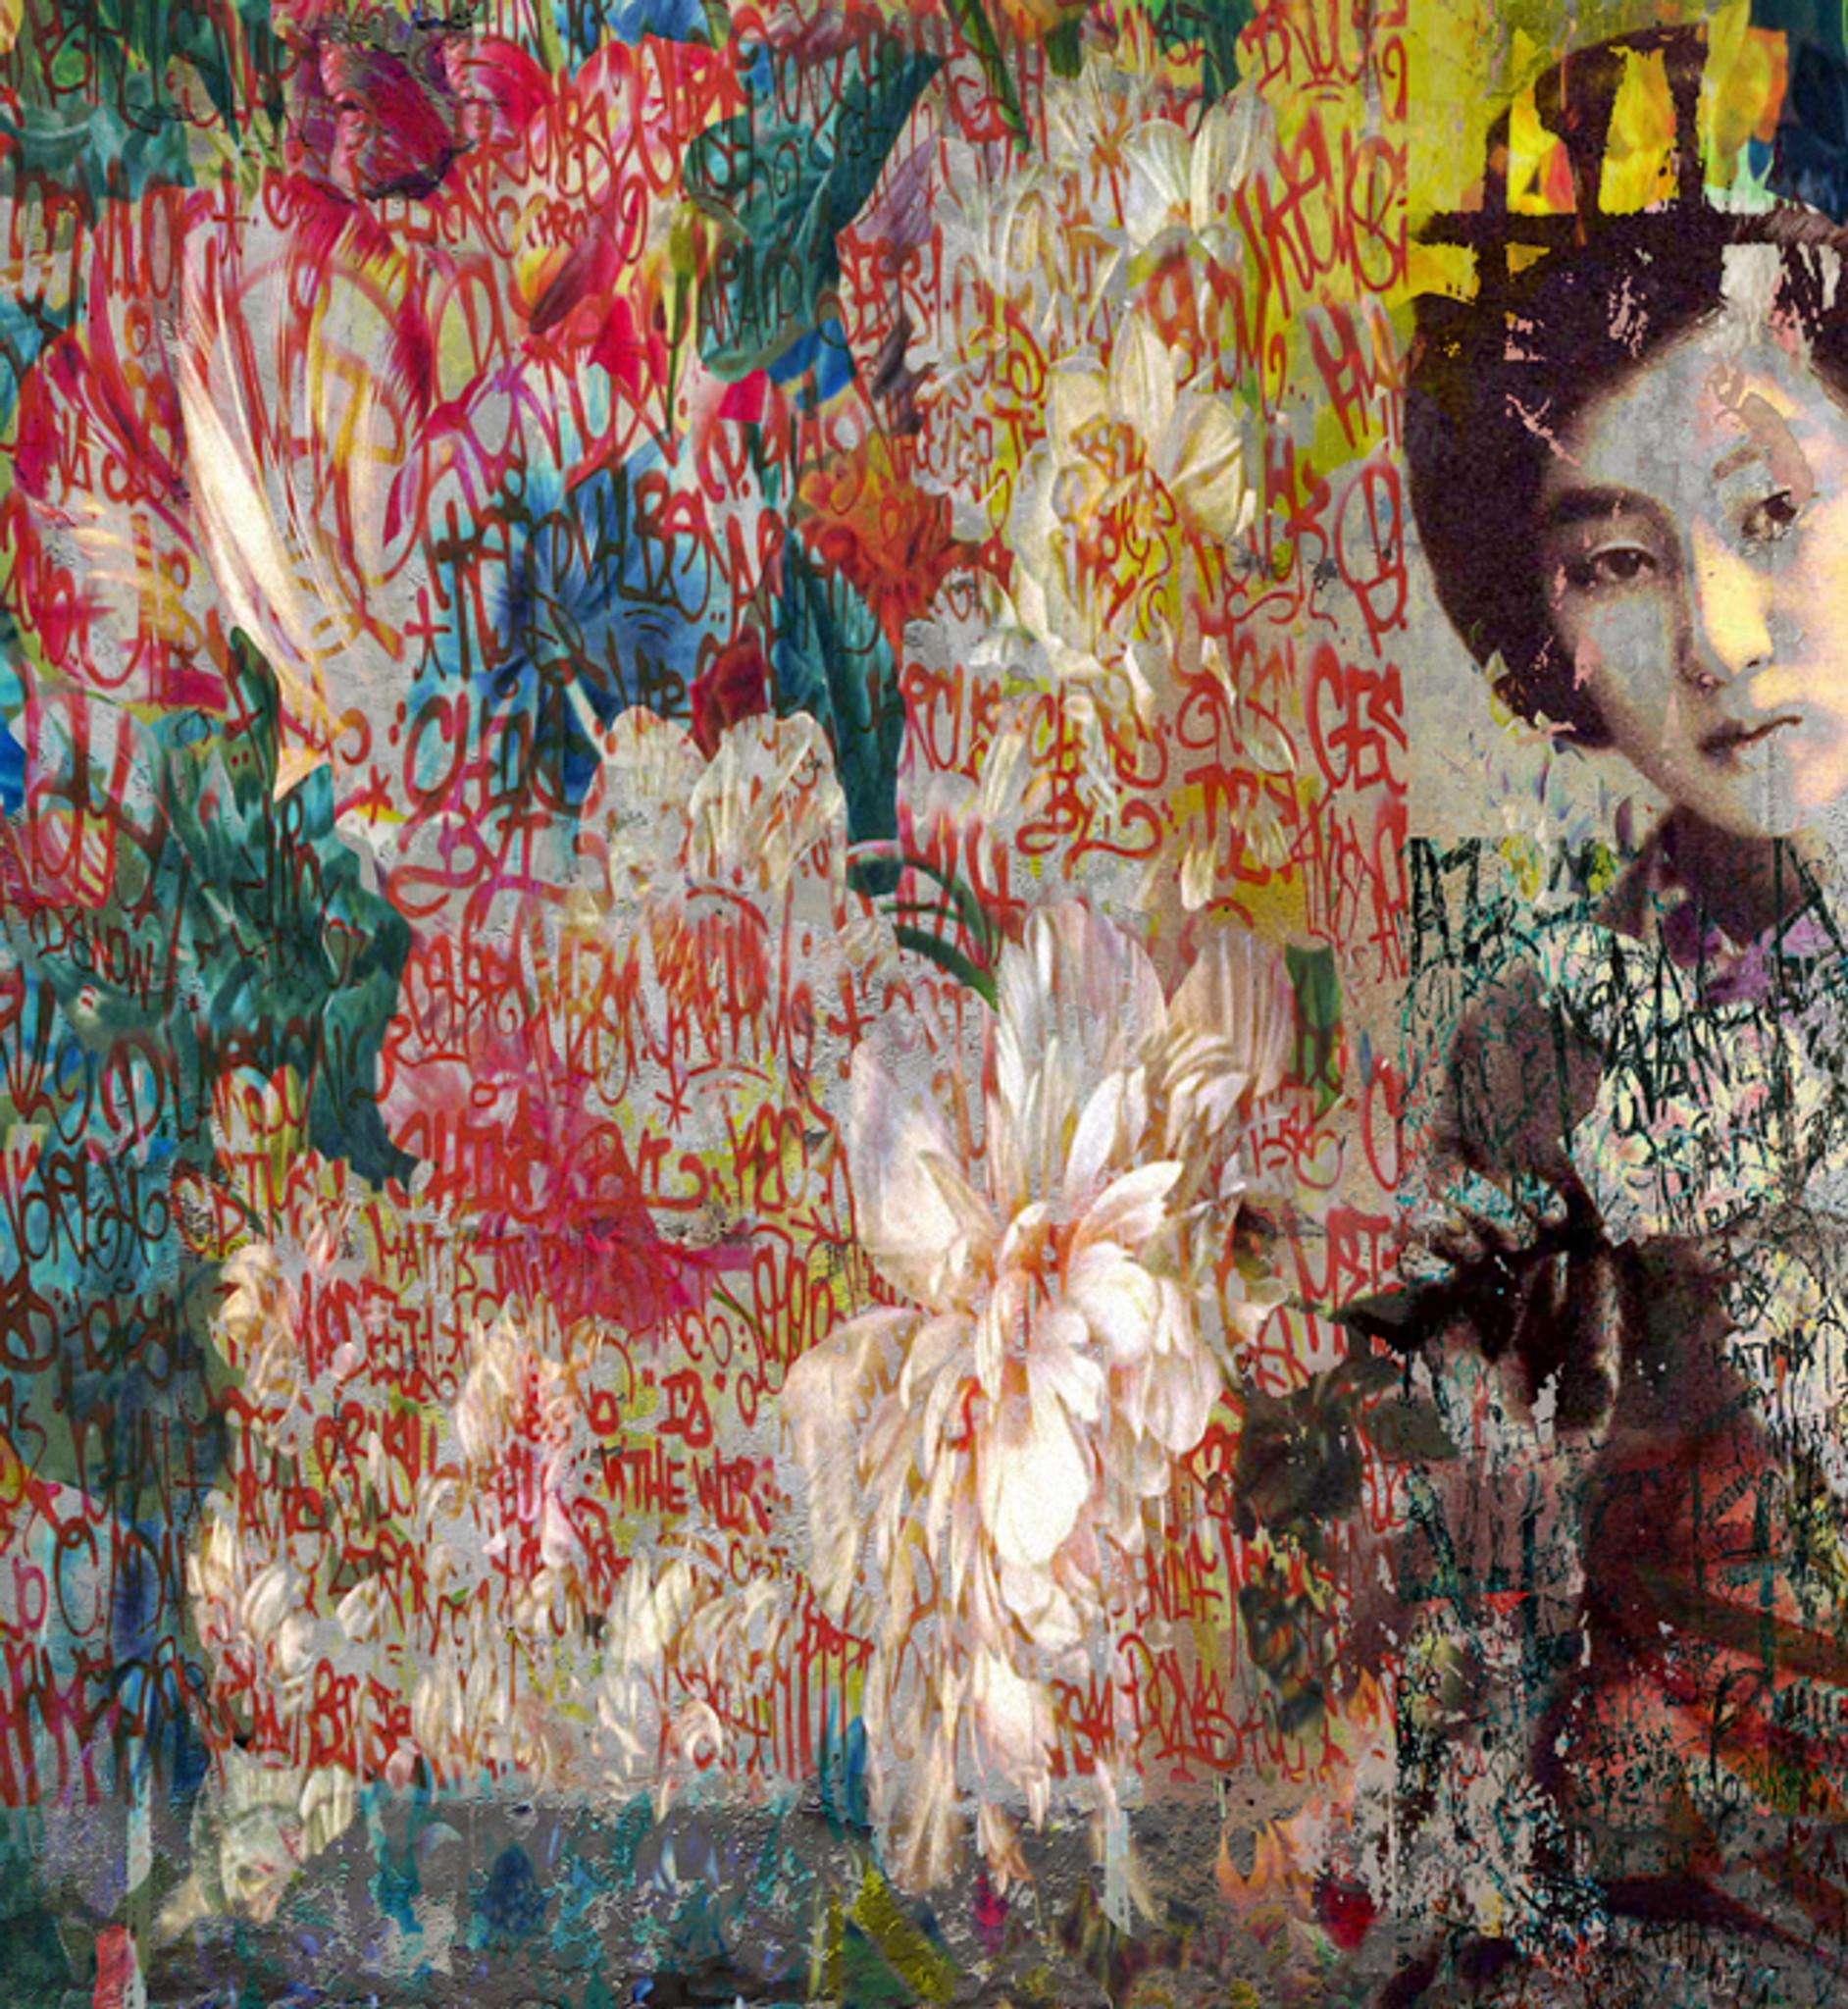 Wallpaper - I Think I'm Turning Japanese - Tokyo Girl